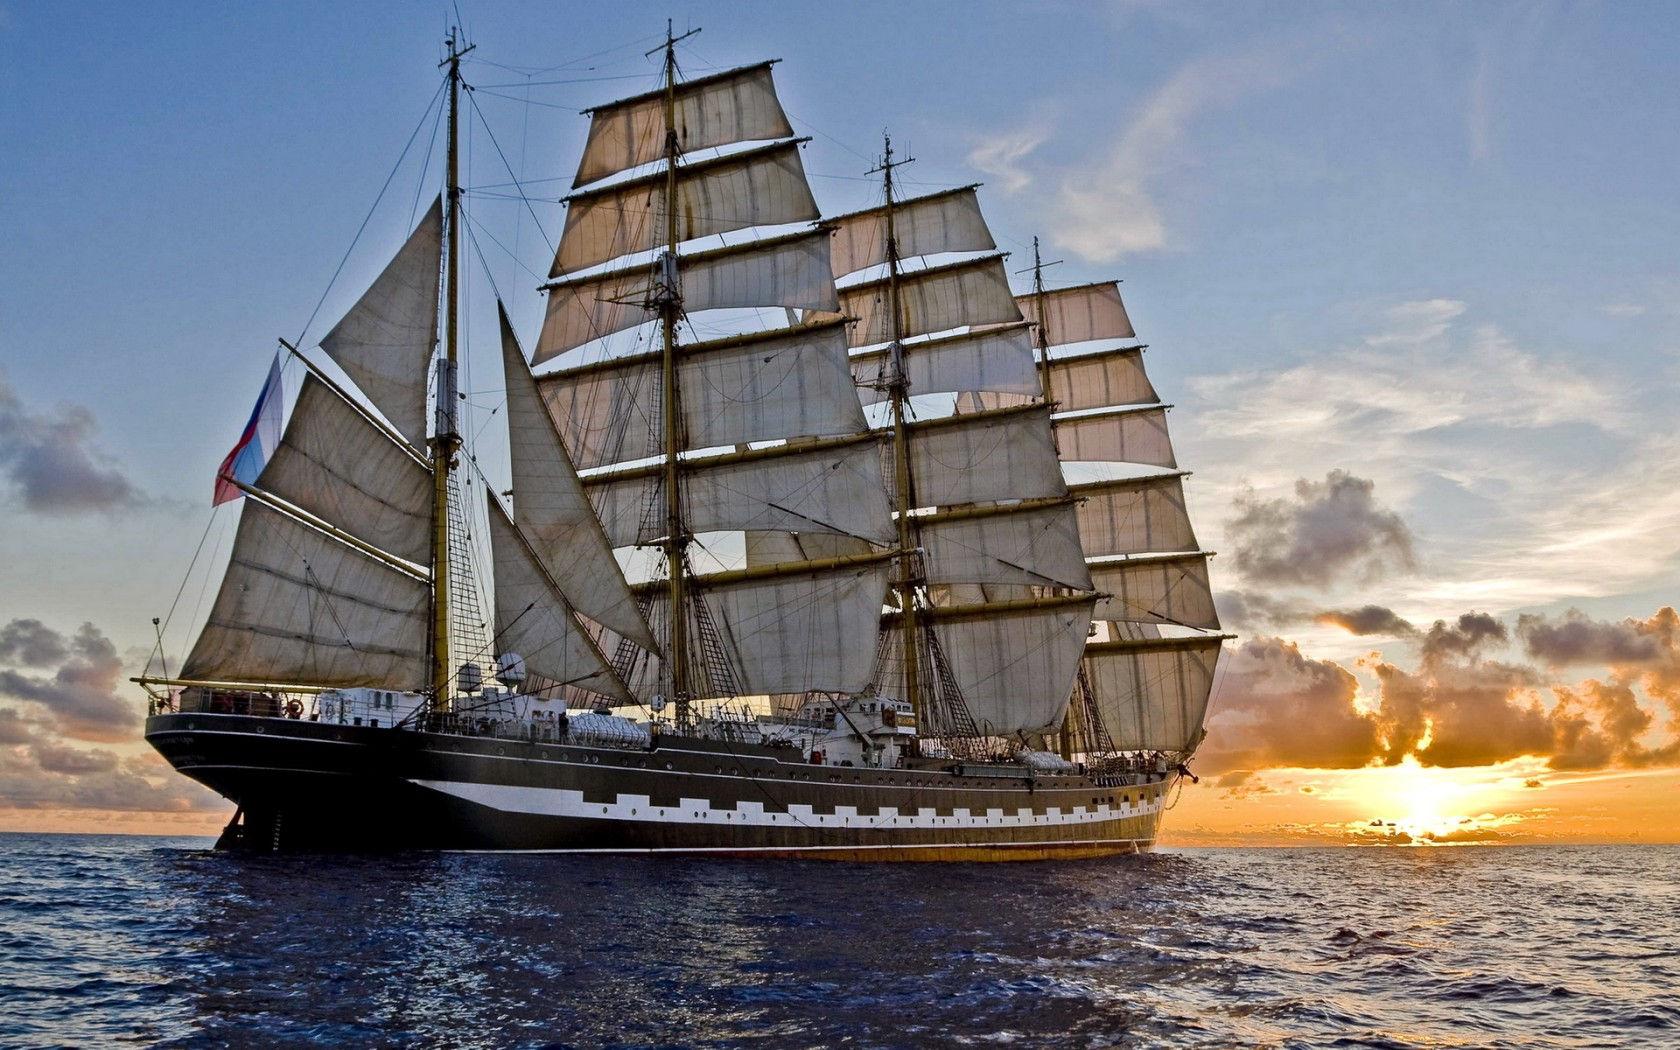 A navegar en el océano de links! #LDV